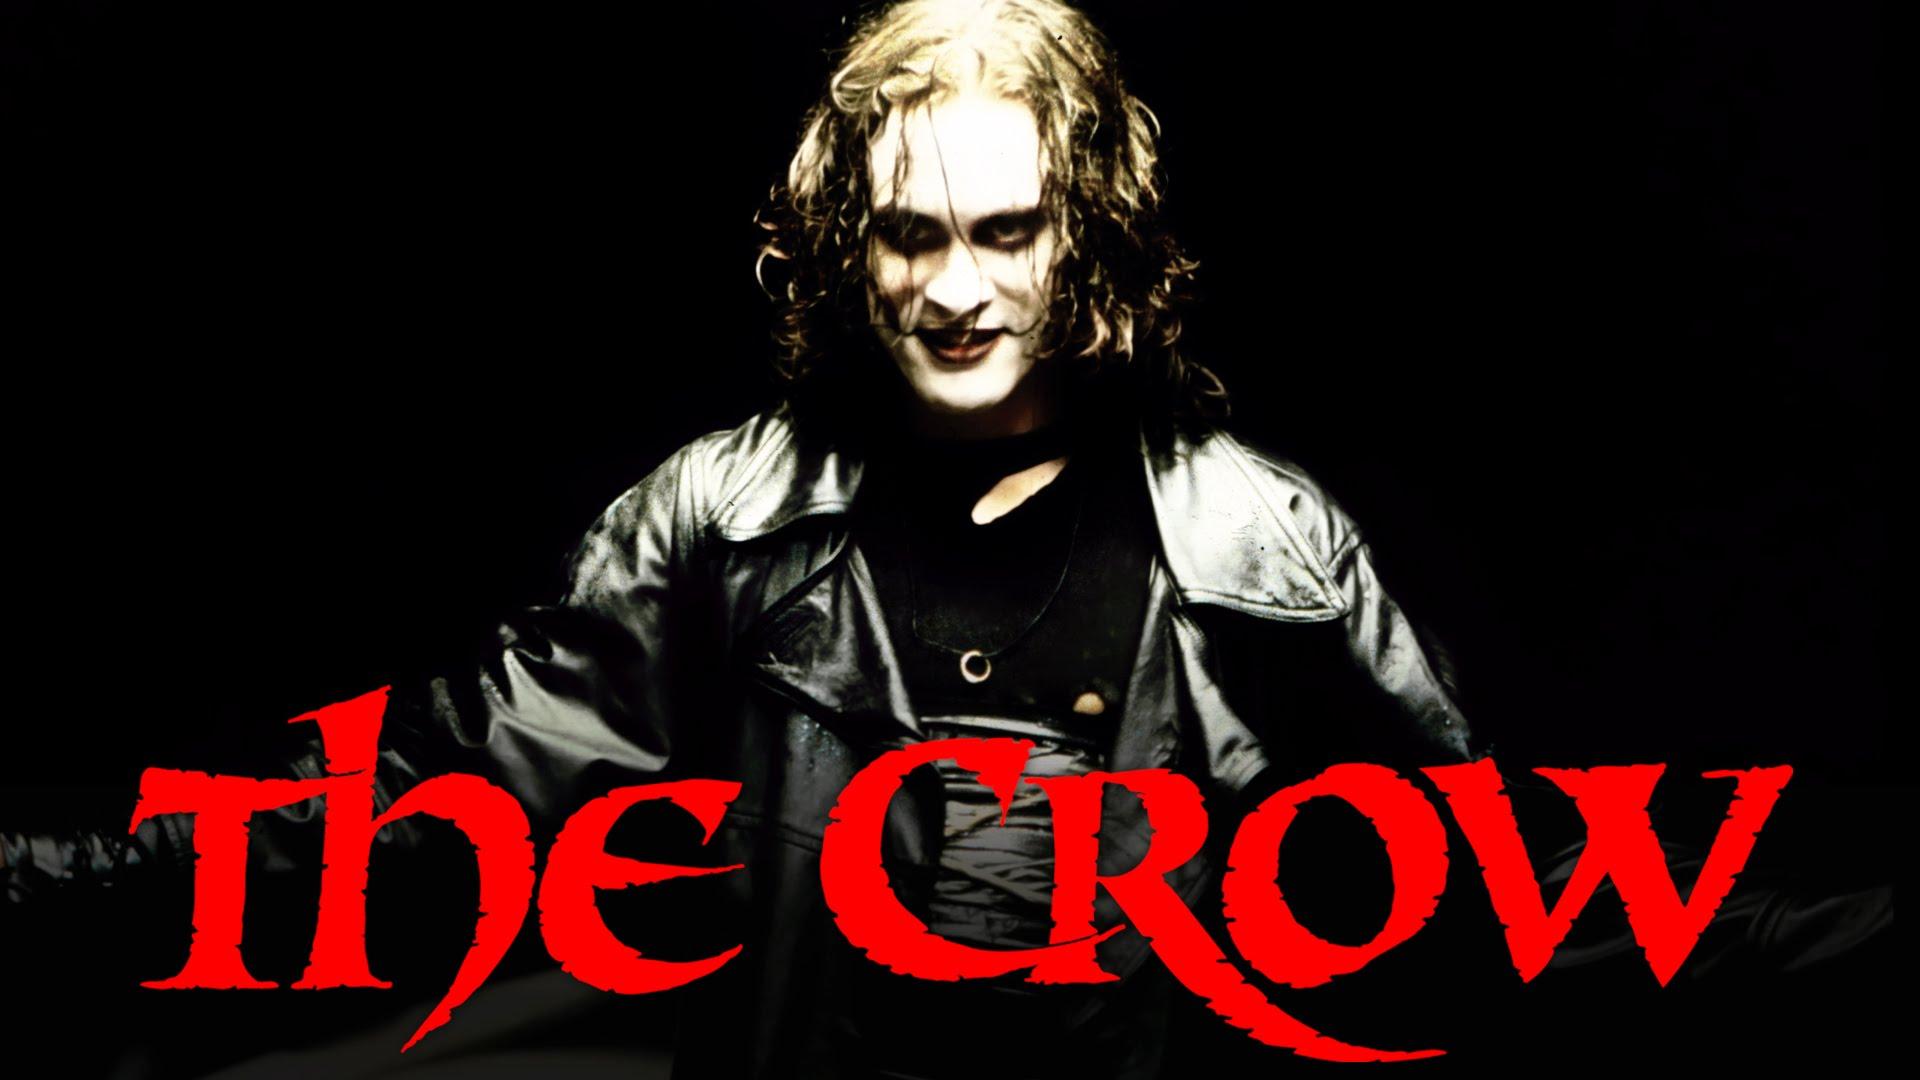 thecrow